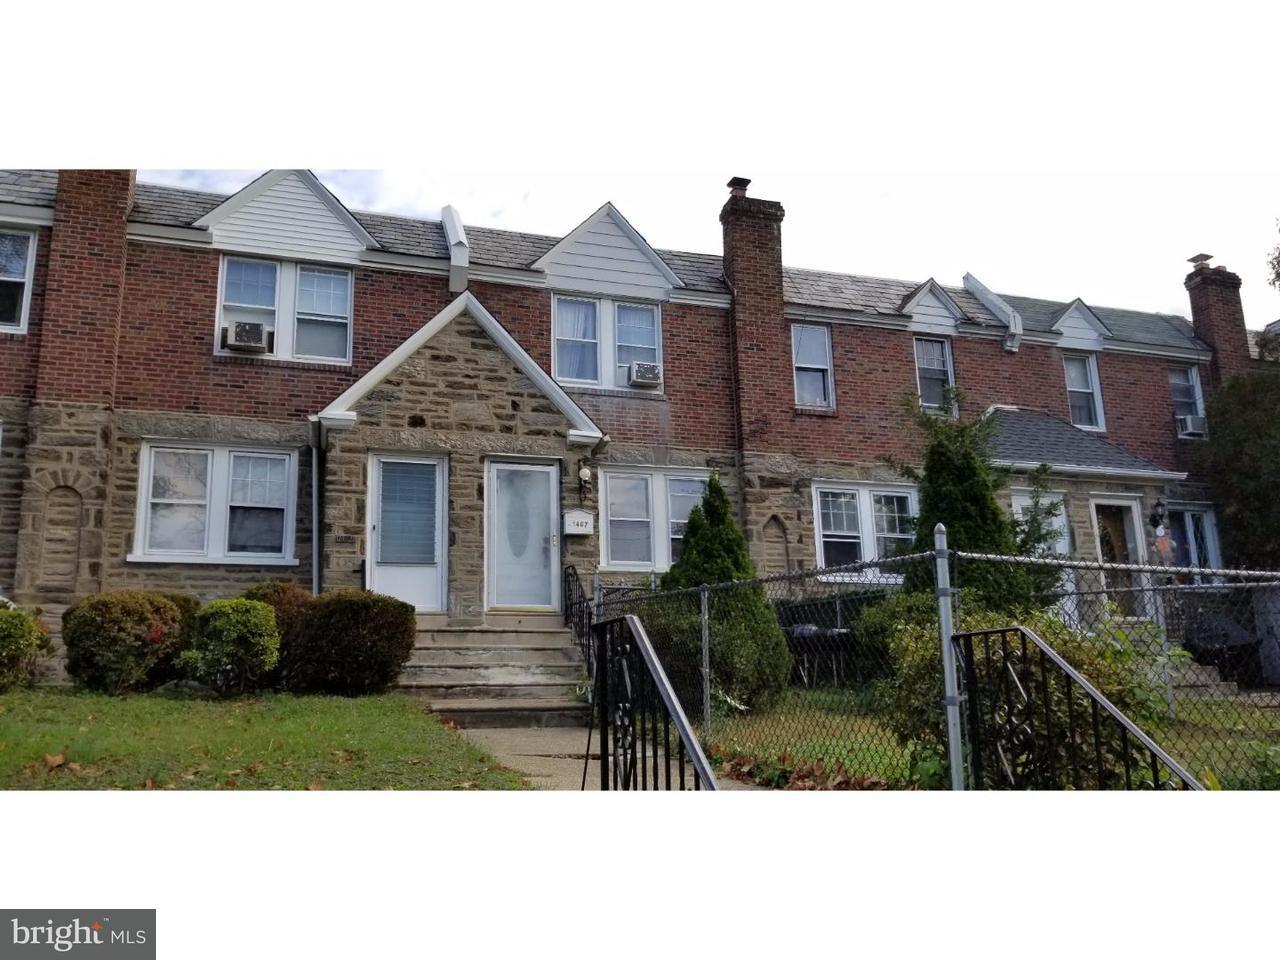 1407  Unruh Philadelphia, PA 19111